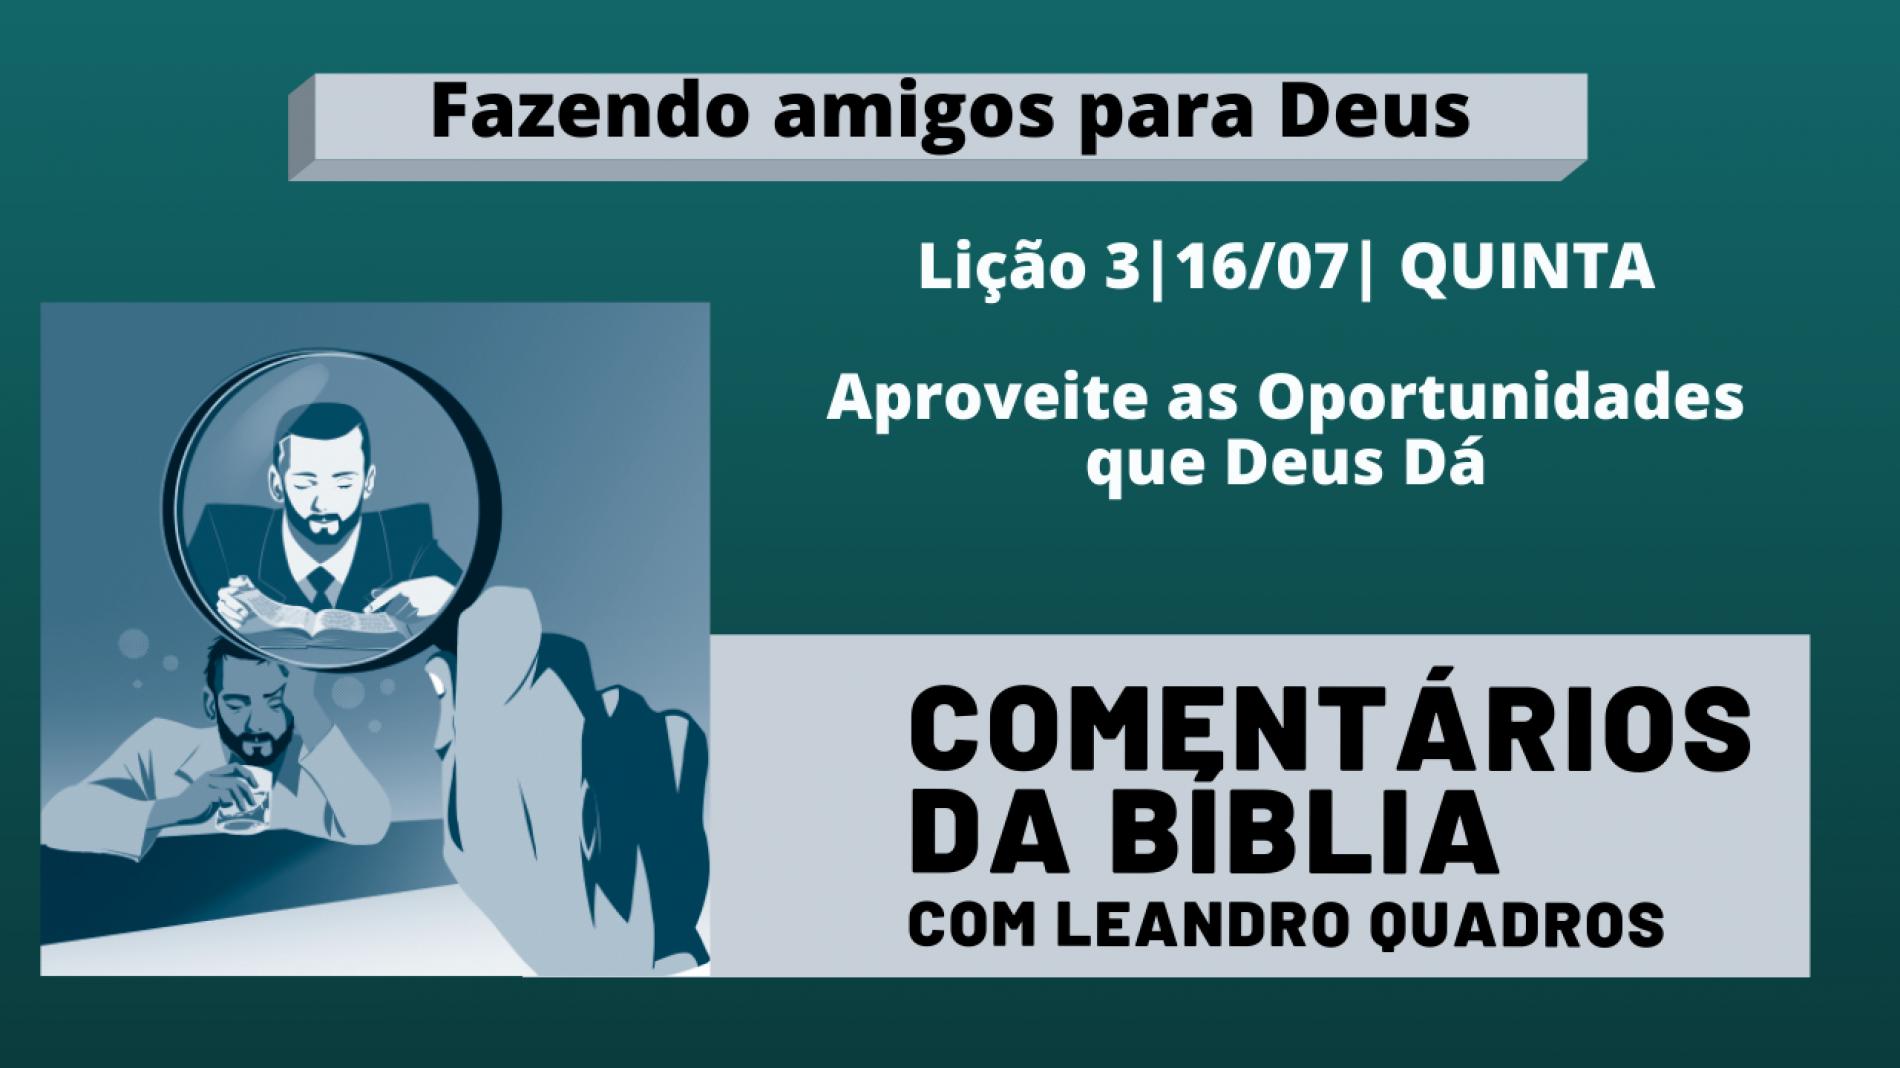 Quinta 16/07 – Aproveite as Oportunidades que Deus Dá